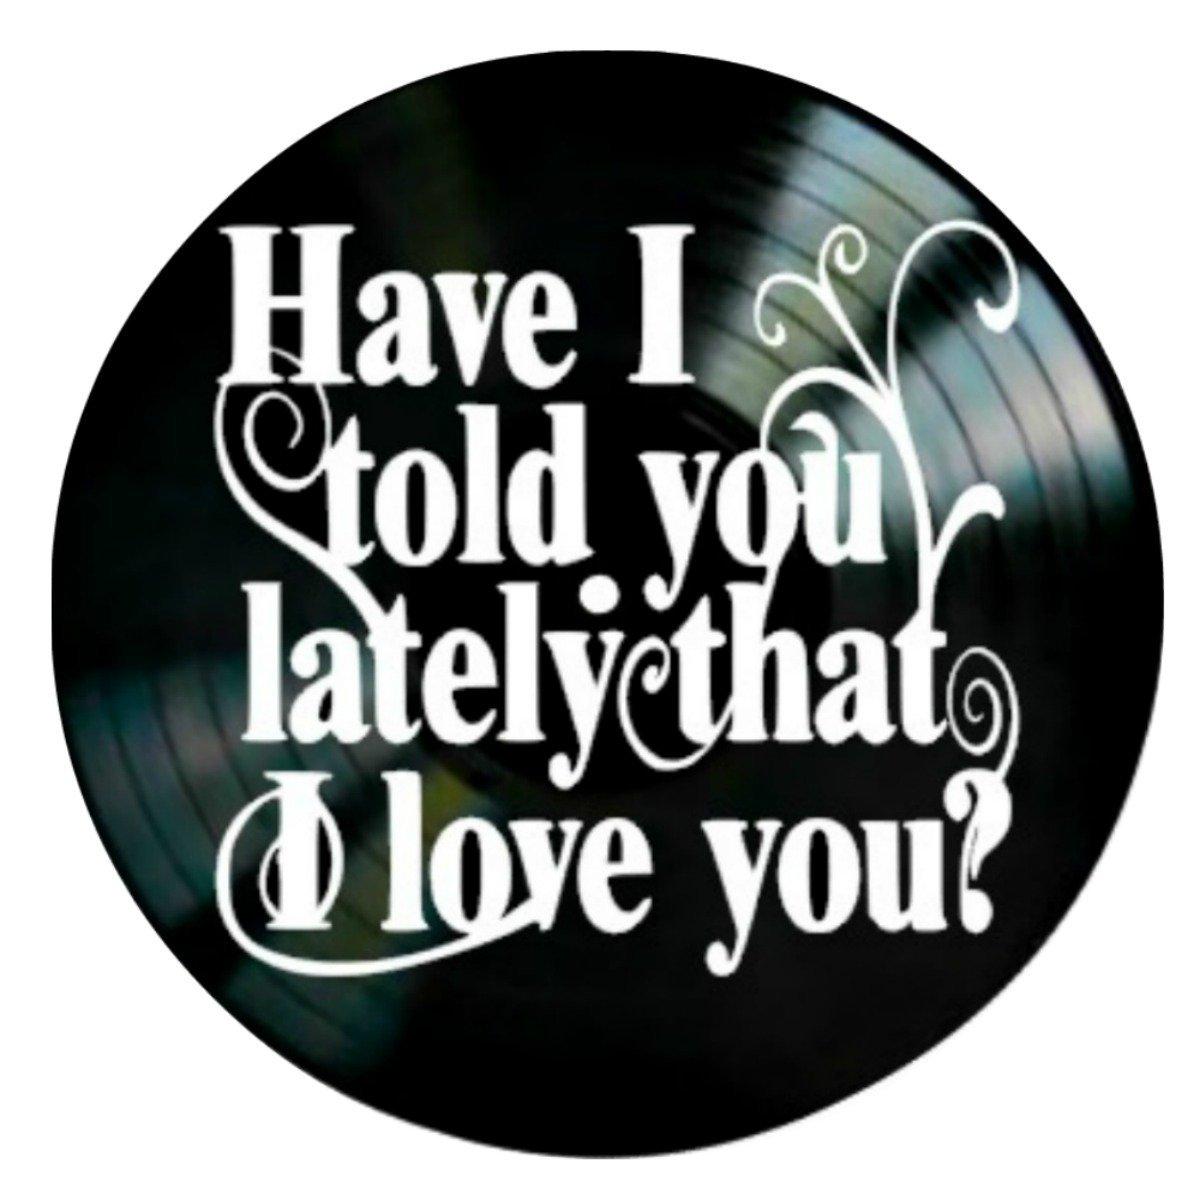 Have I Told You Lately song lyrics by Van Morrison/Rod Stewart on a Vinyl Record Album Wall Art